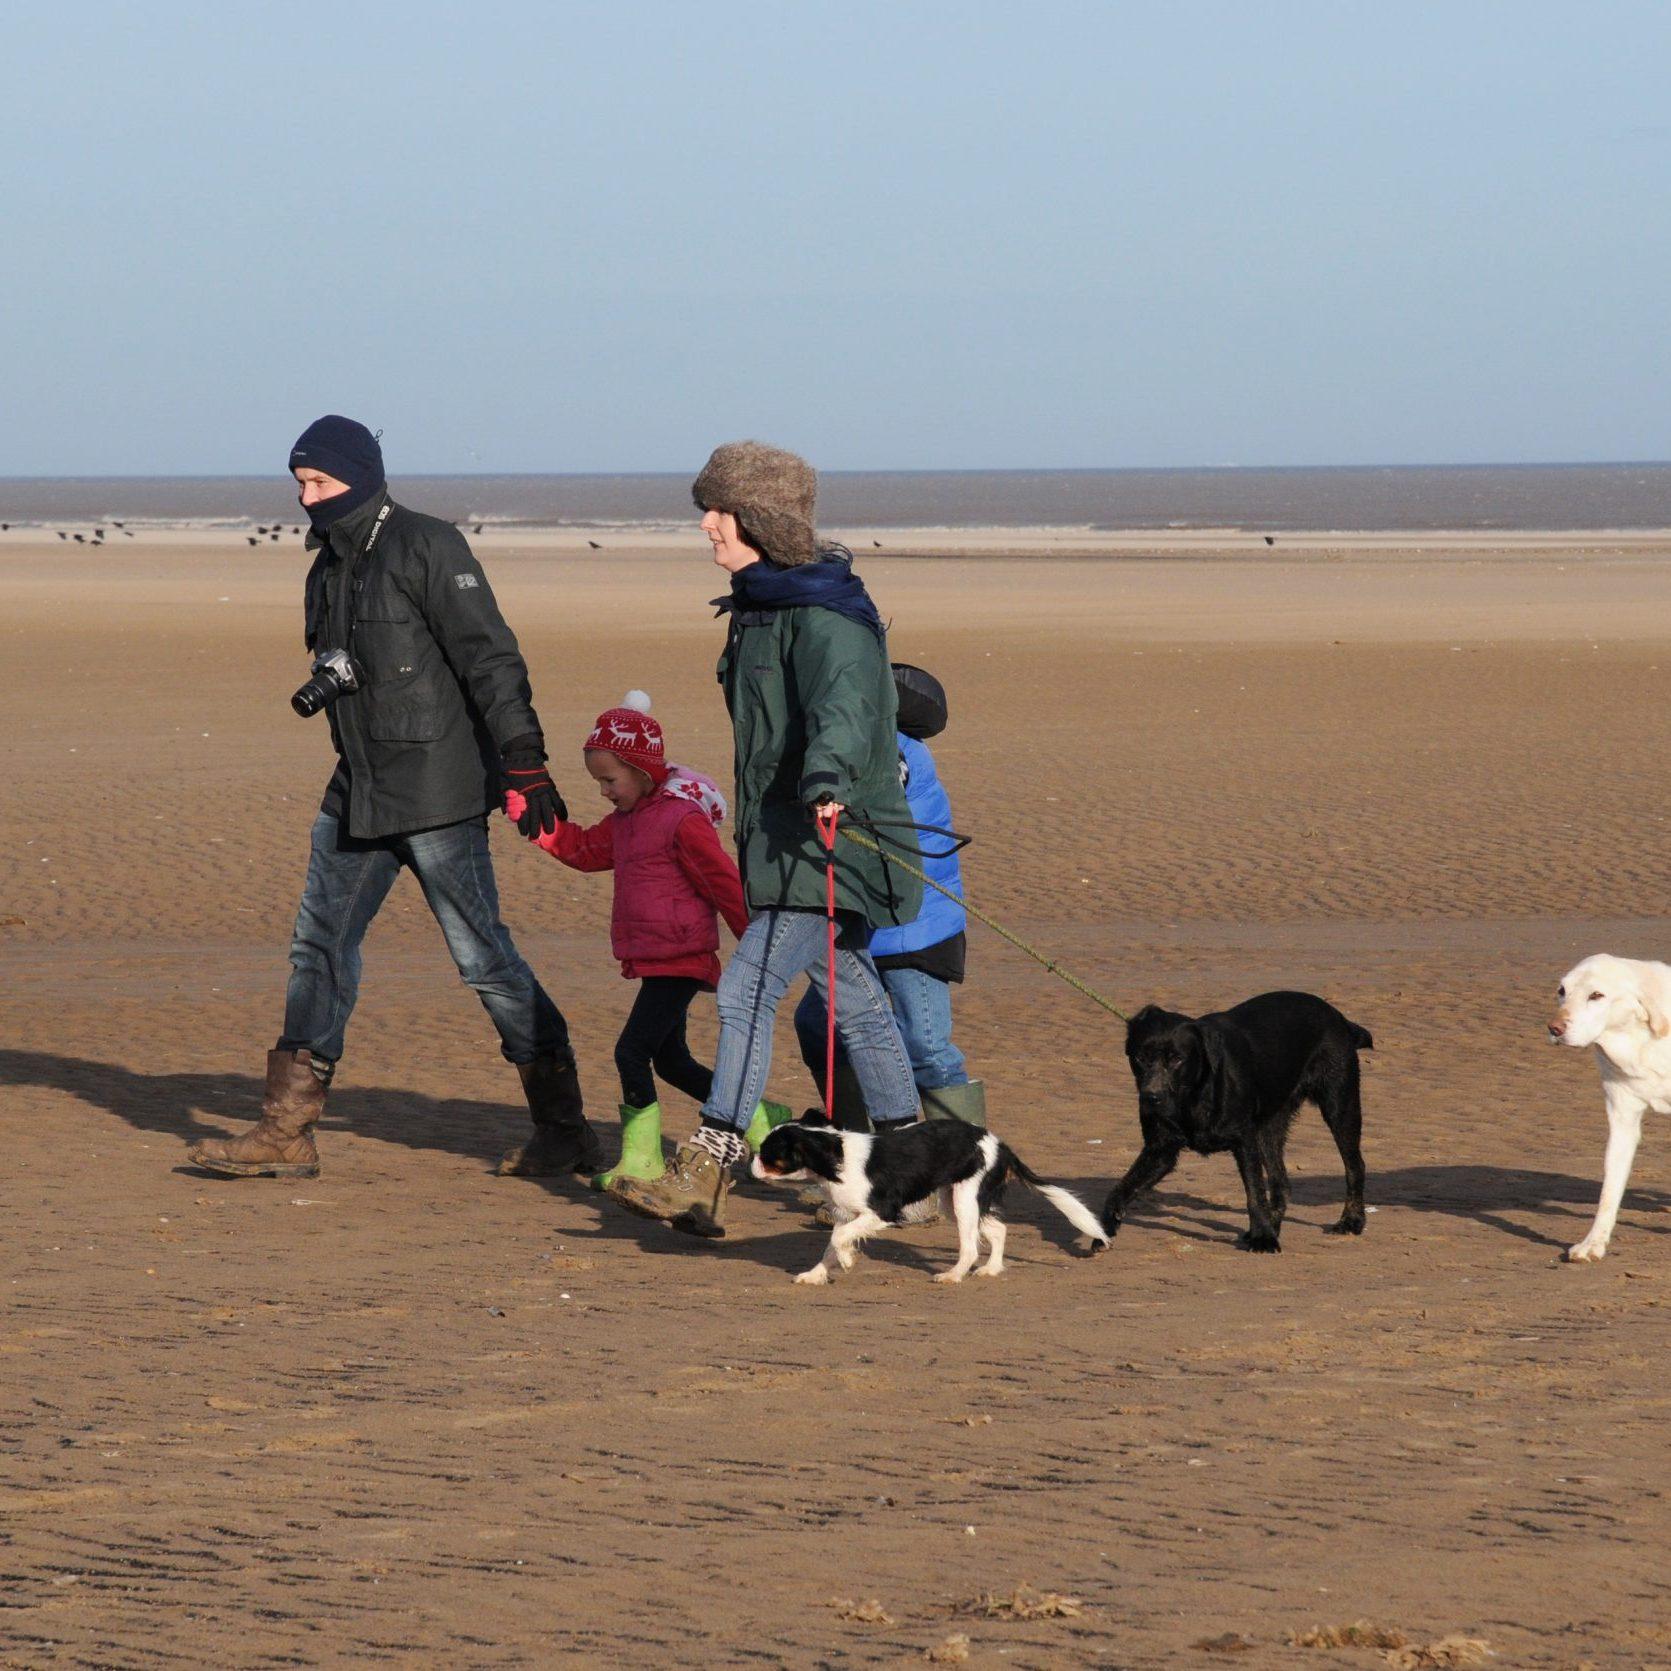 Saltfleetby - dog walking family on beach